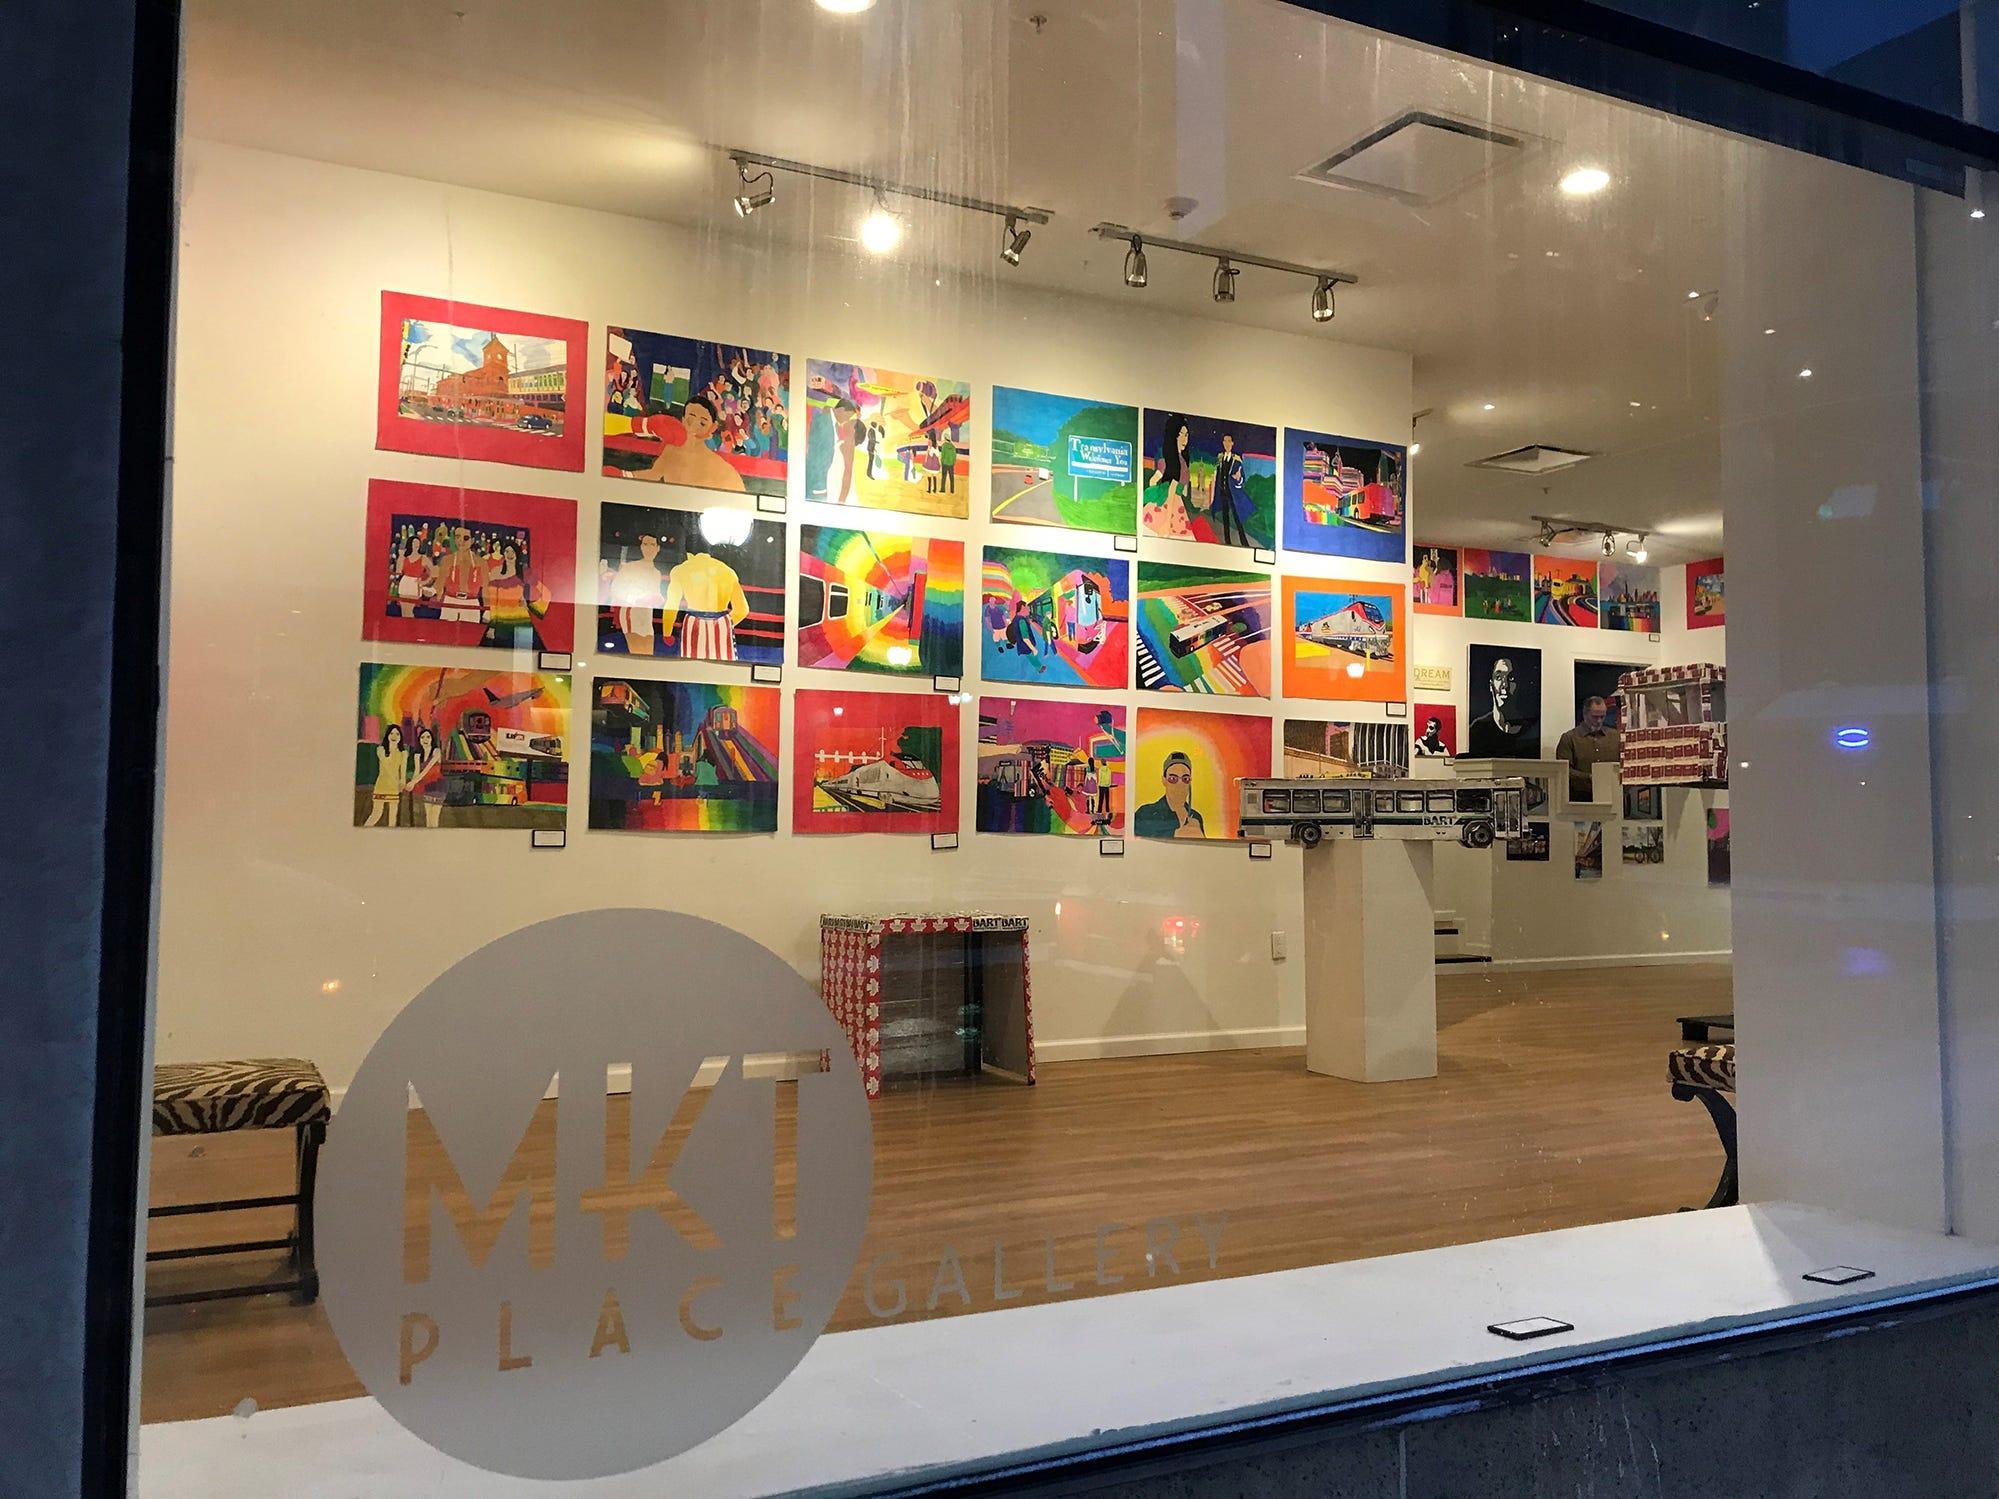 Geraldo Gonzalez's works glow in the light through the MKT Place gallery on Market Street in Wilmington.